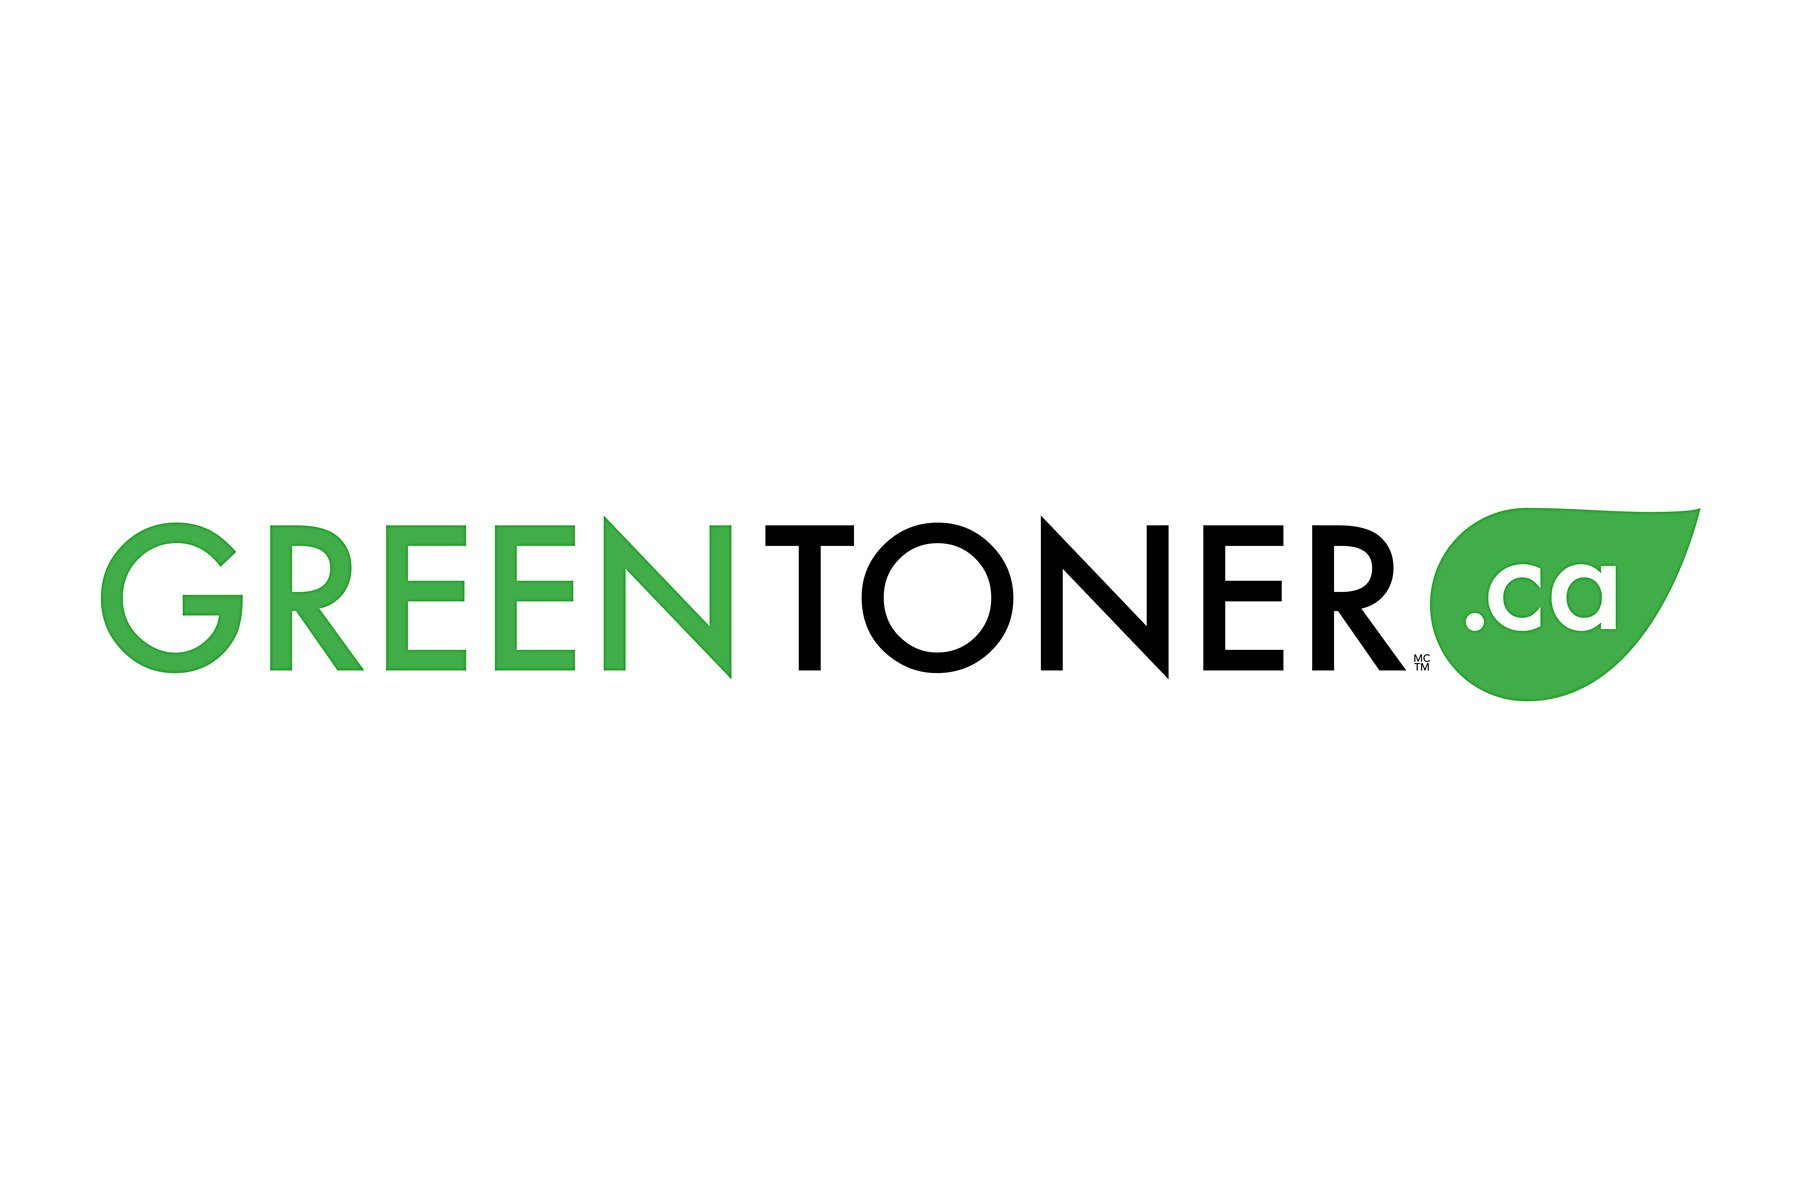 IMD-Greentoner-Iogo Greentoner - logo